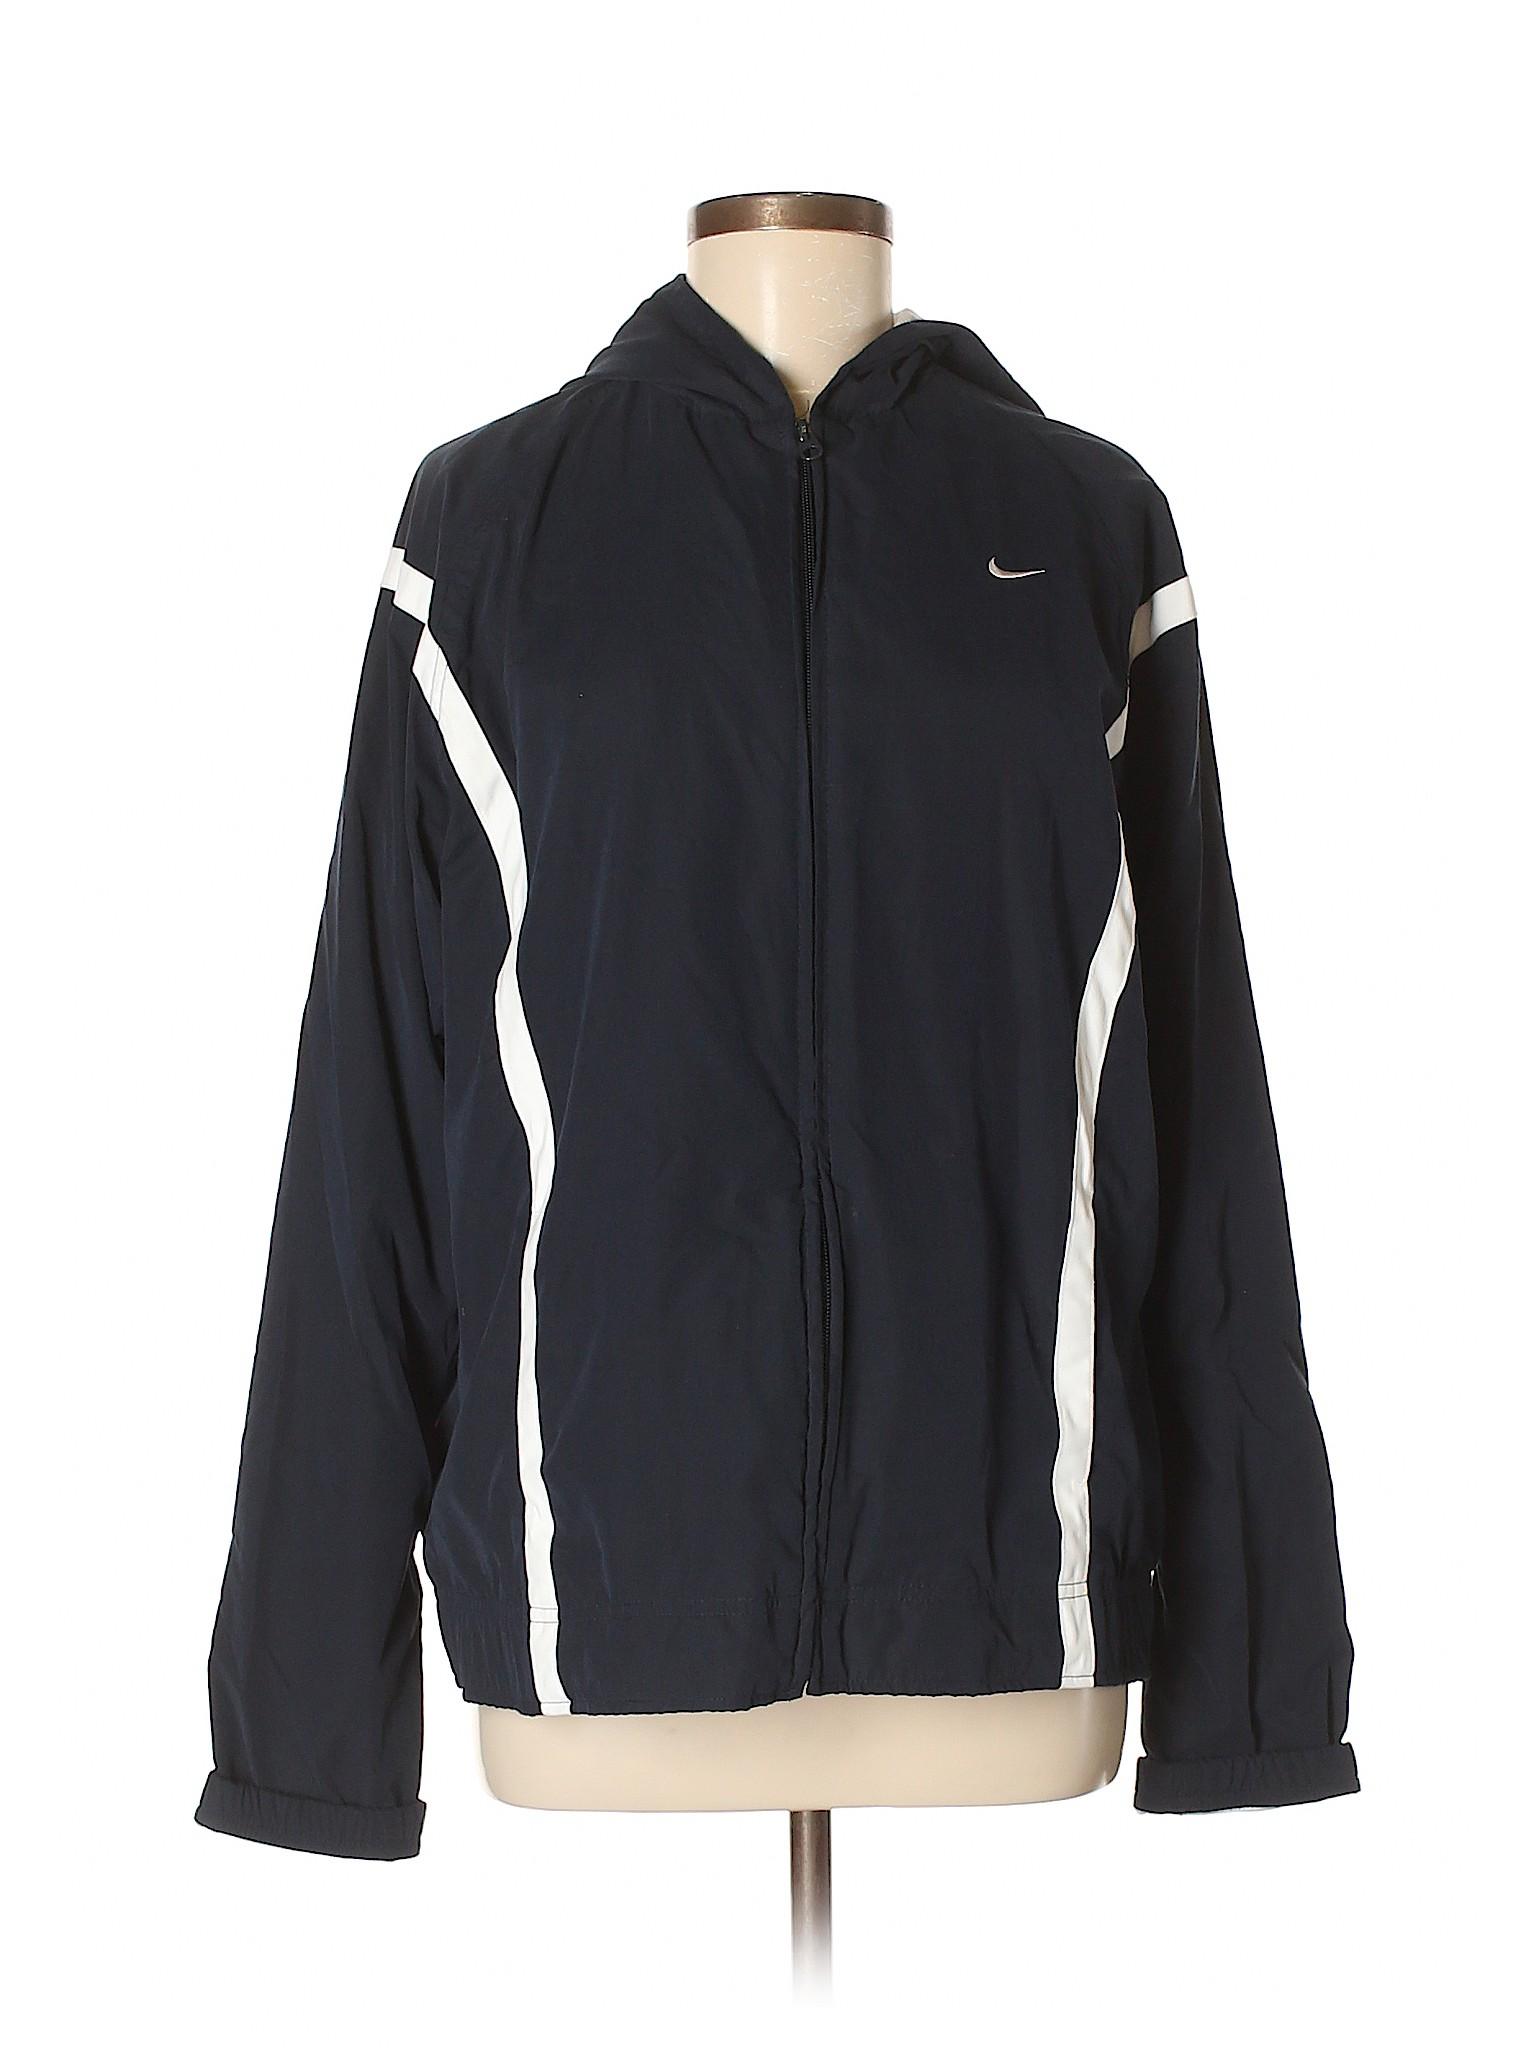 leisure Boutique Jacket leisure Nike Jacket Nike Boutique Boutique xwpIaqXp